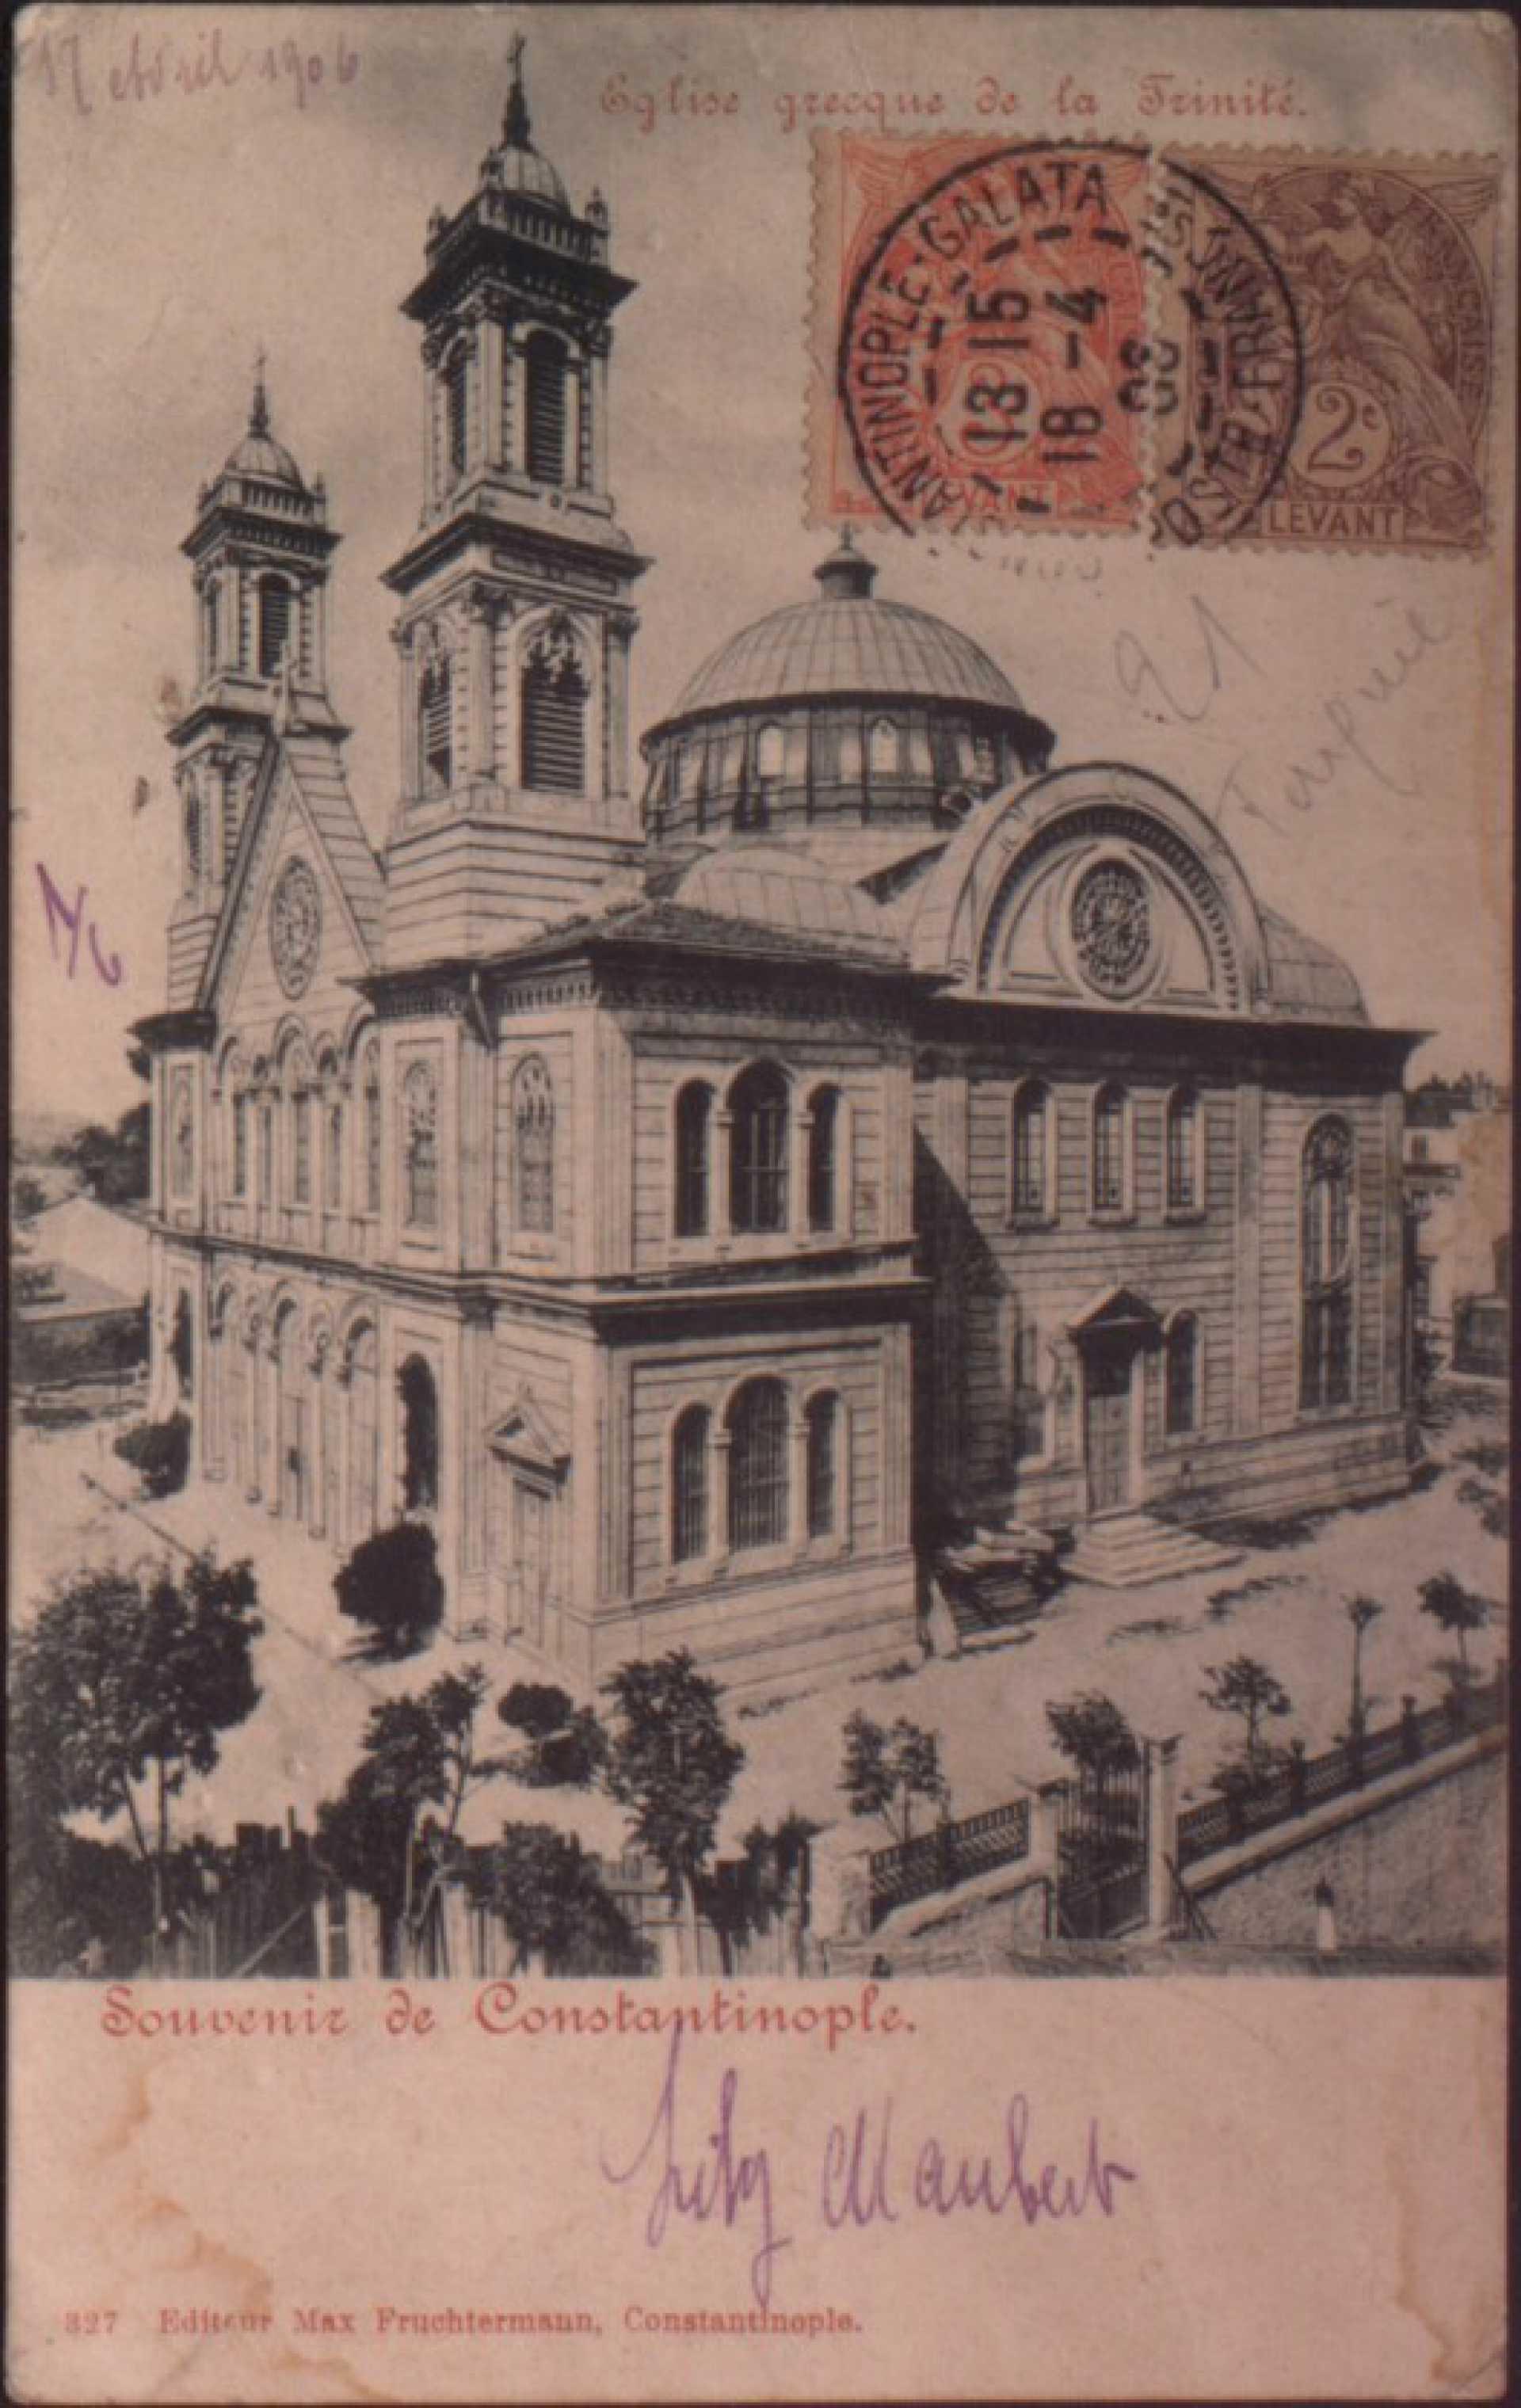 Eglise grecque de la Trinite